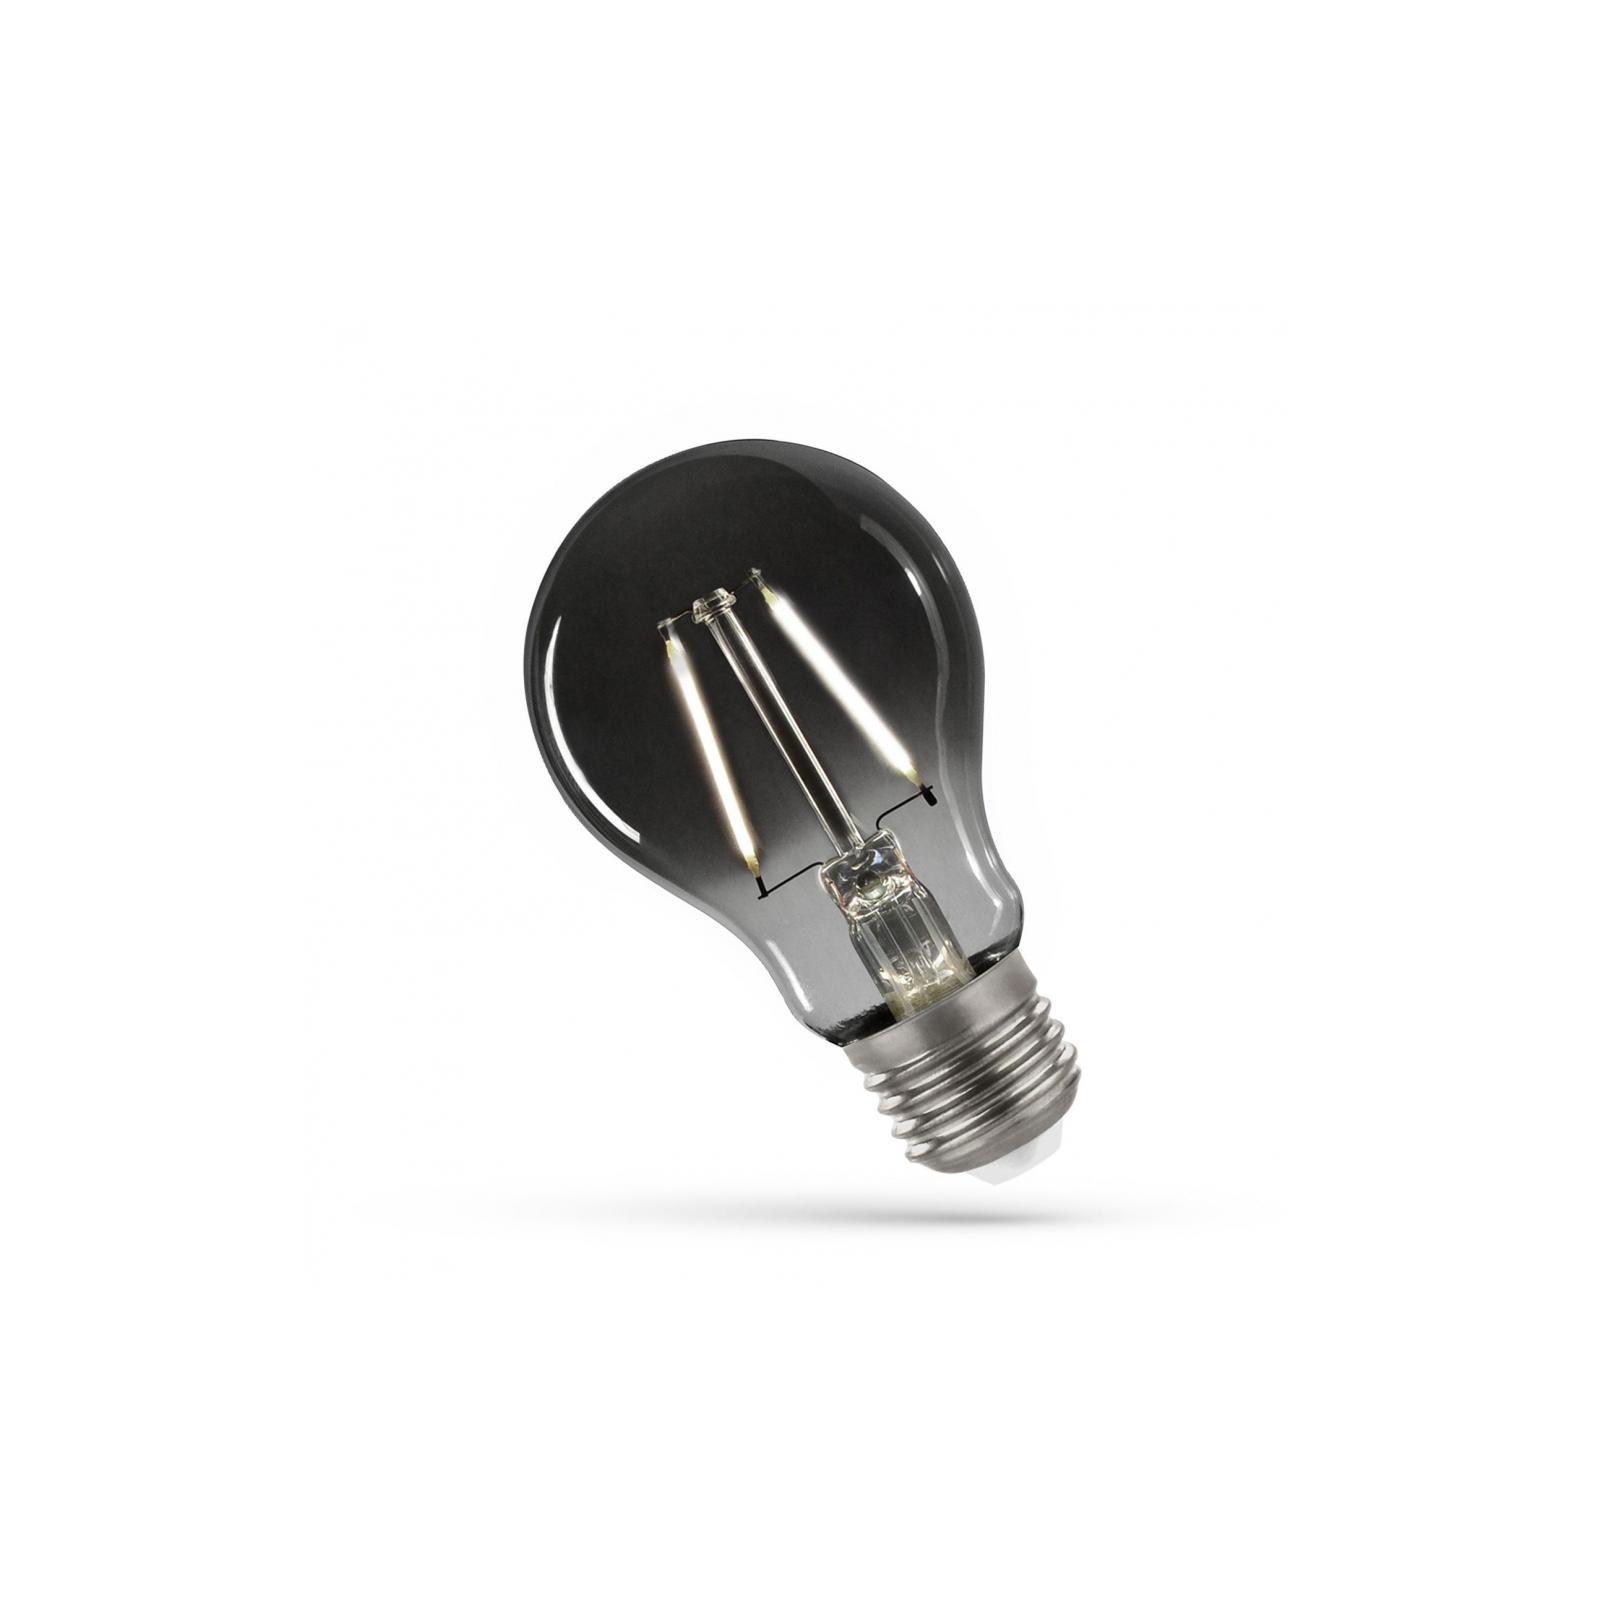 LED GLS E-27 230V 2.5W COG Neutrální bílá MODERNSHINE SPECTRUM